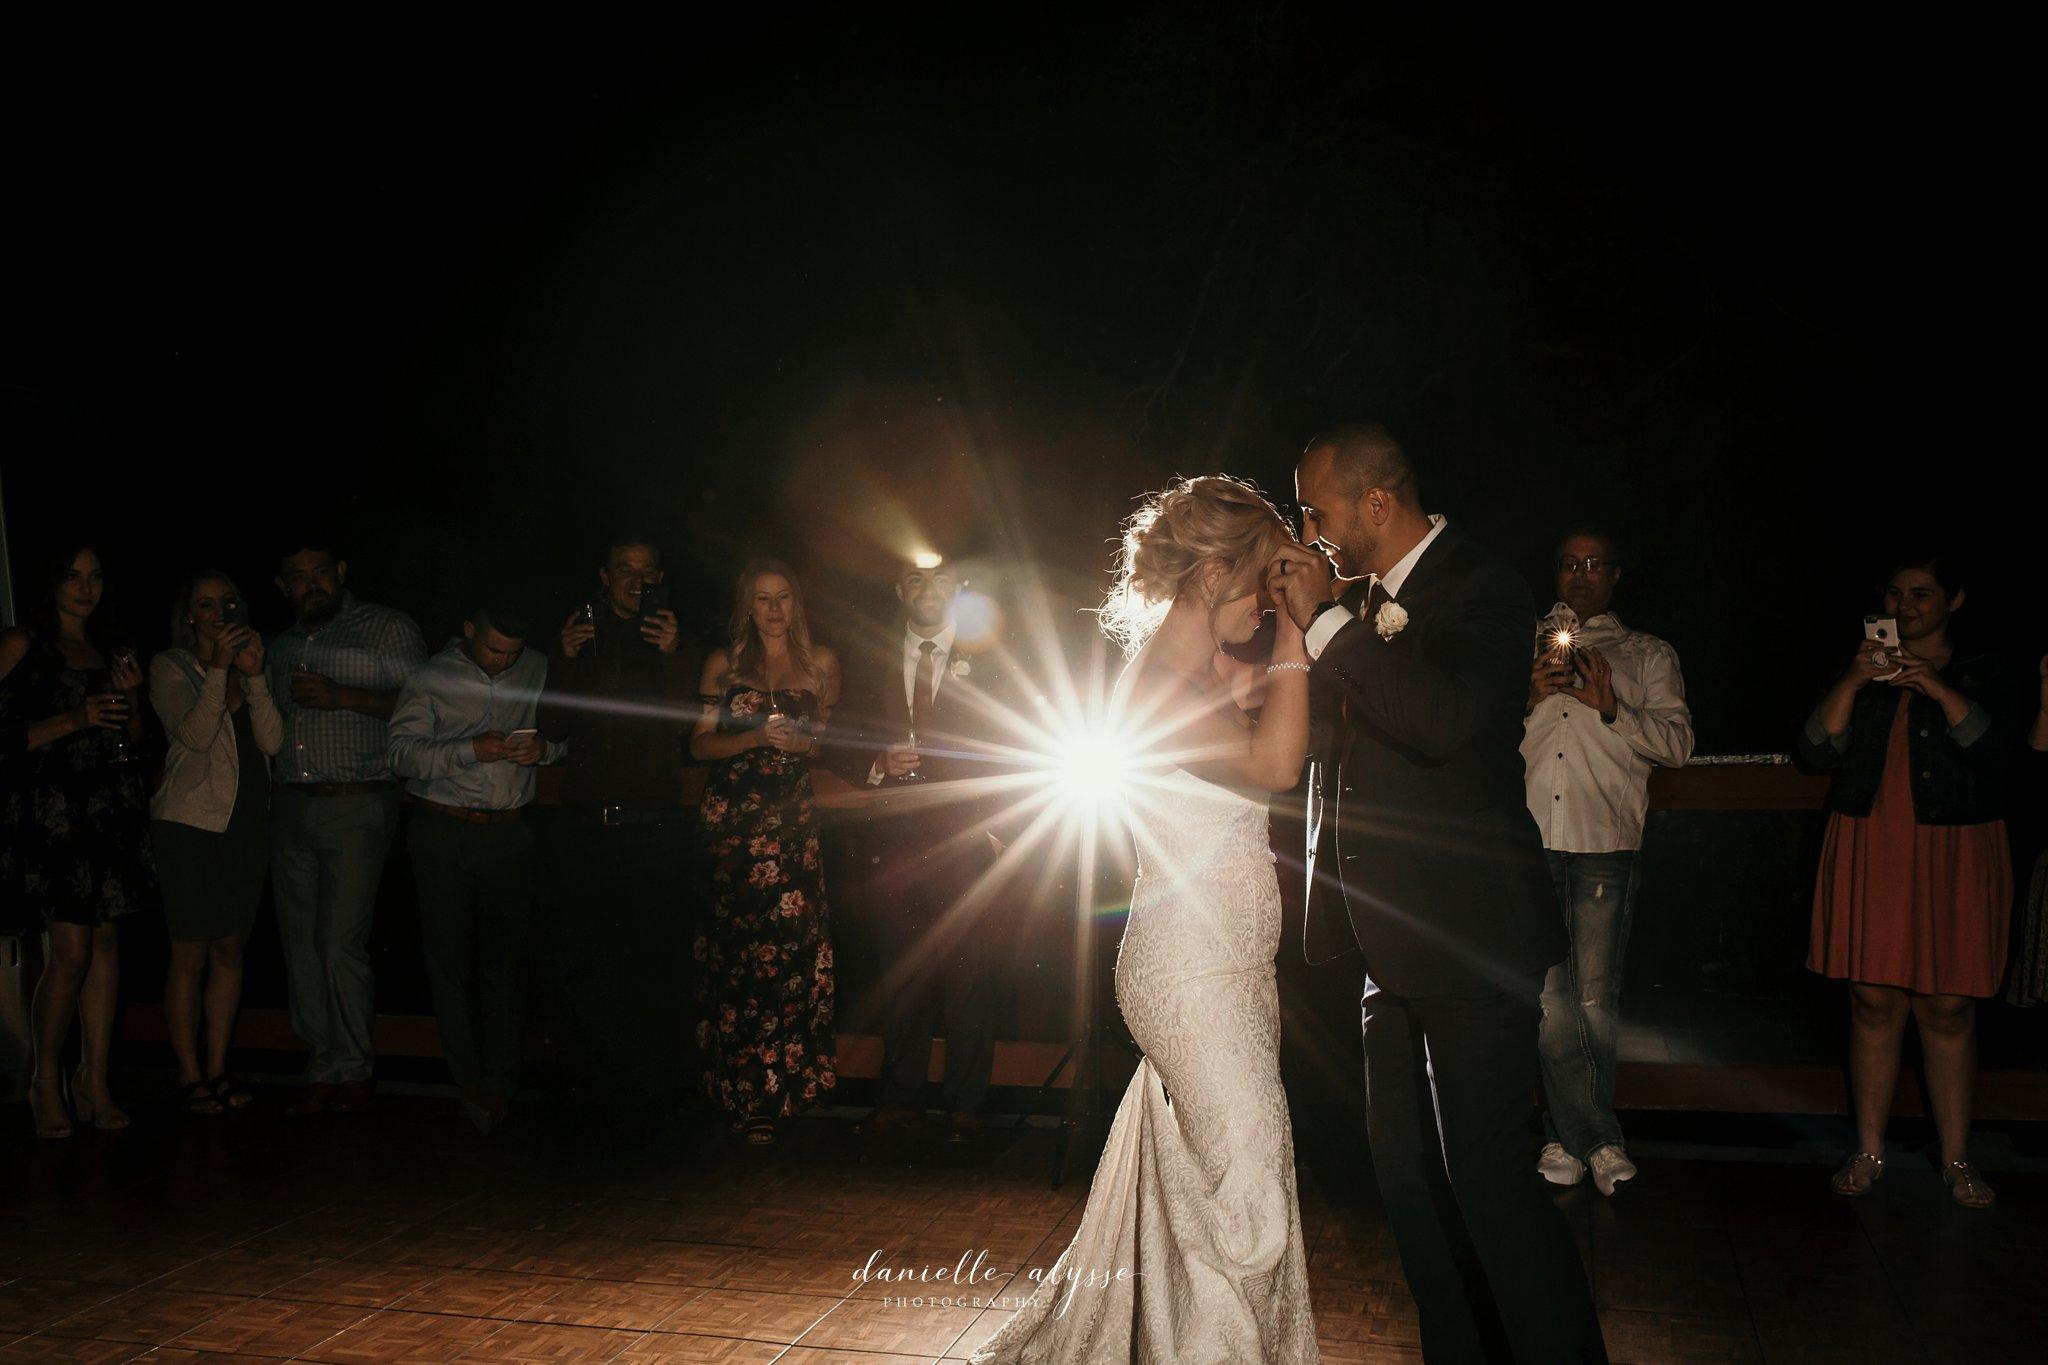 180831_wedding_stephanie_heavenly_south_lake_tahoe_danielle_alysse_photography_destination_blog_1174_WEB.jpg